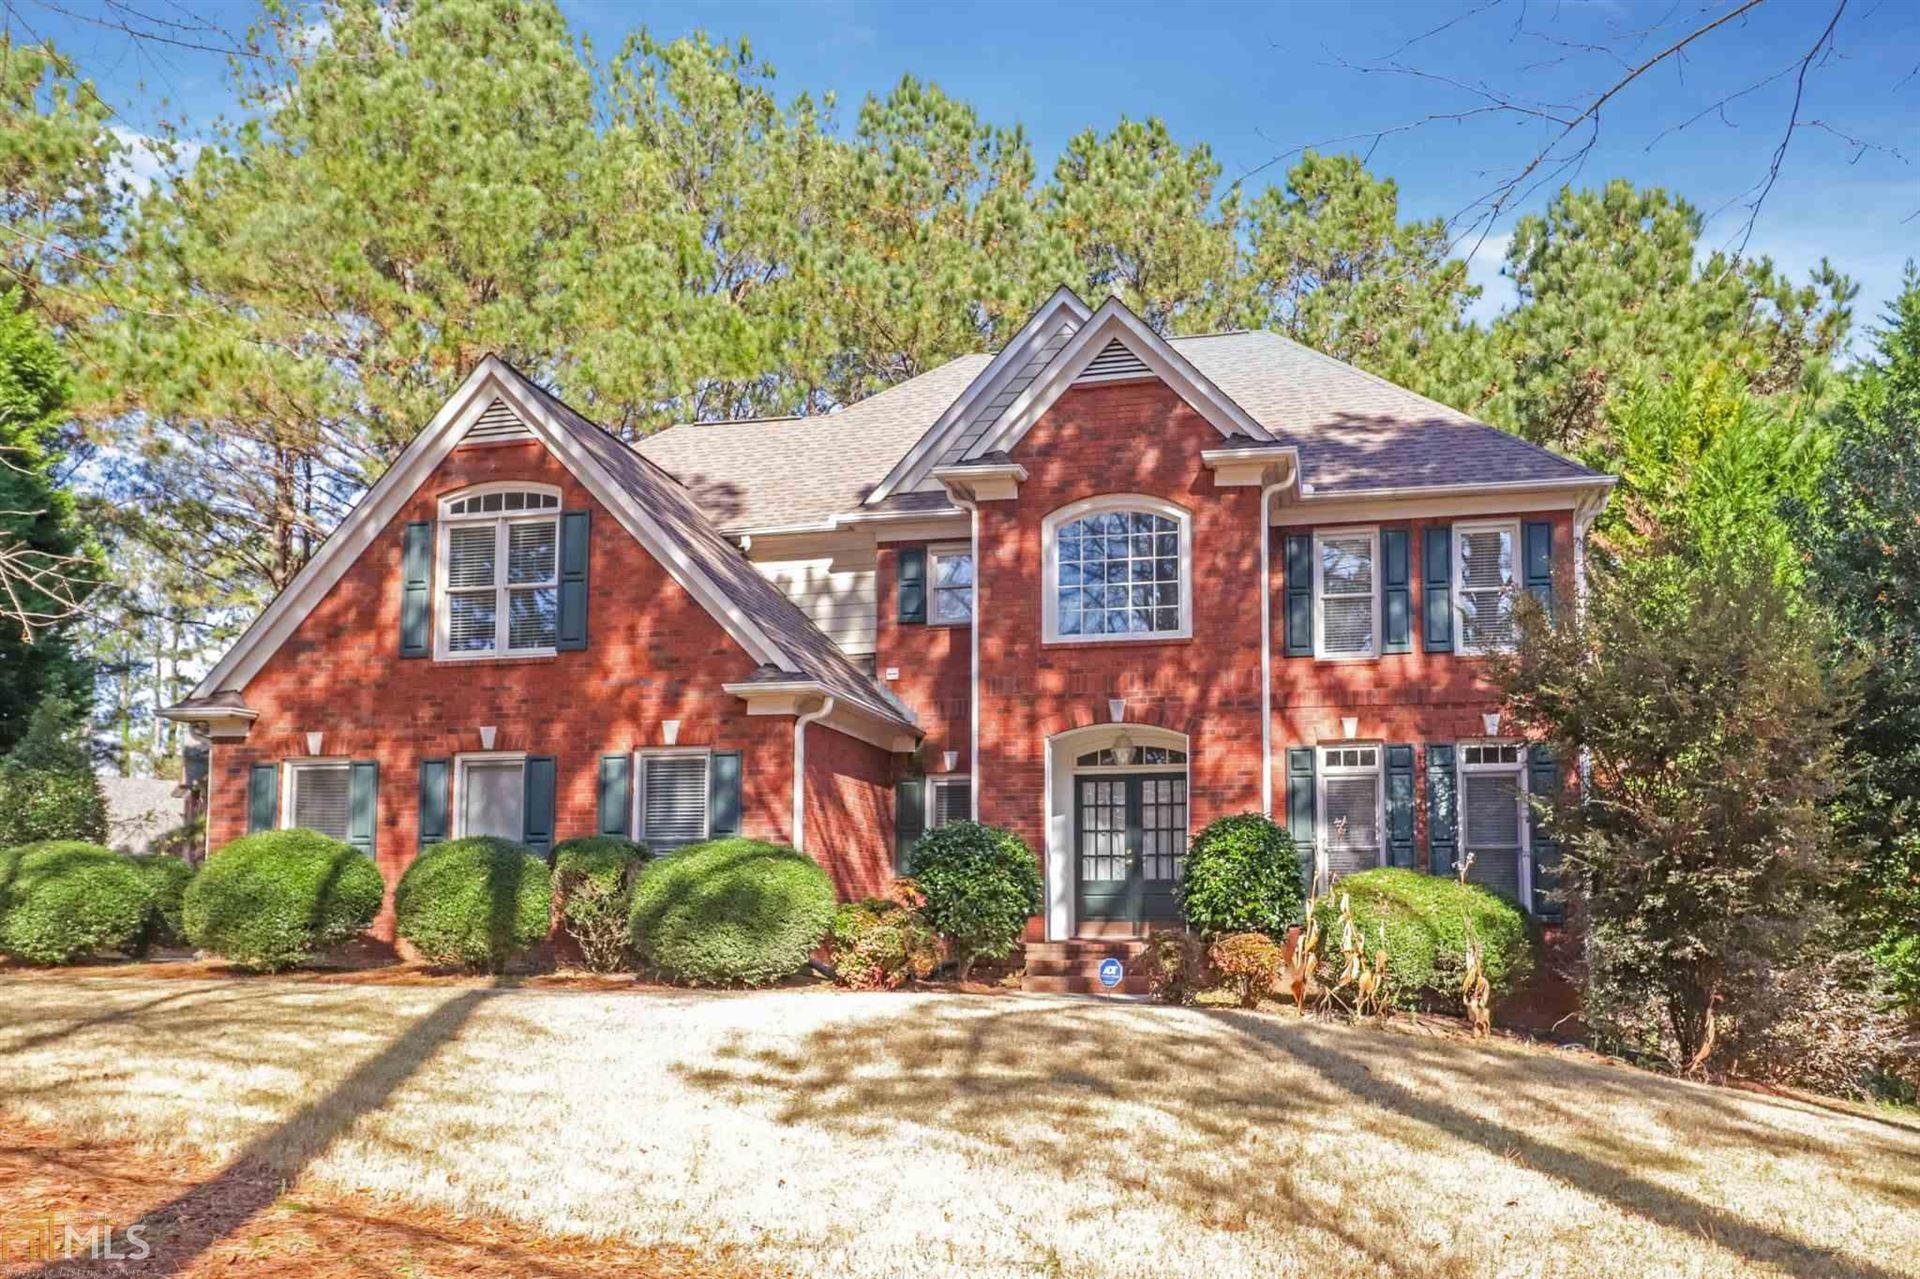 125 Glenwood Ln, Fayetteville, GA 30215 - MLS#: 8899784